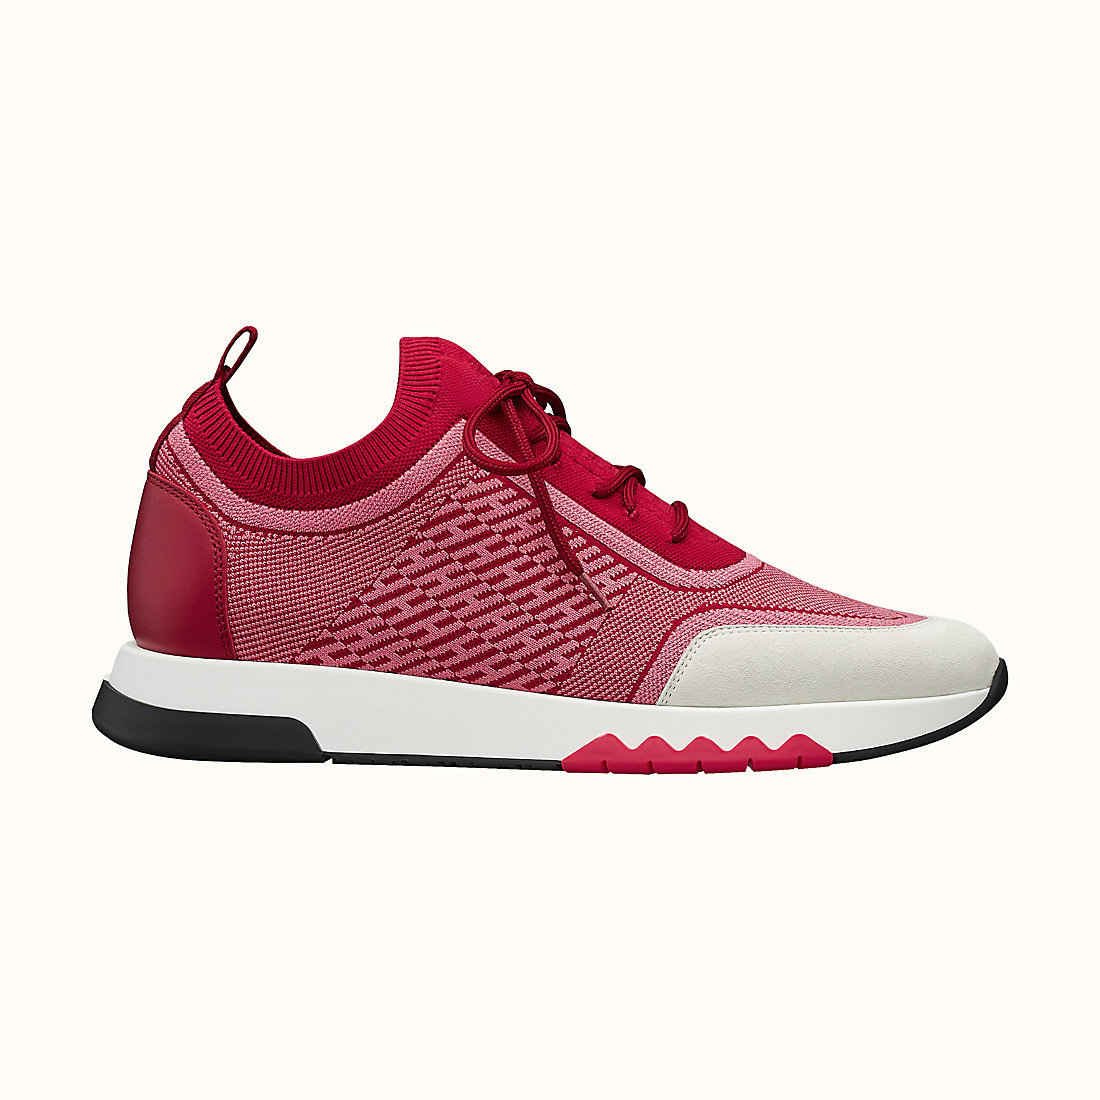 HERMES Addict sneaker Rose Baie/Rose Sorbet